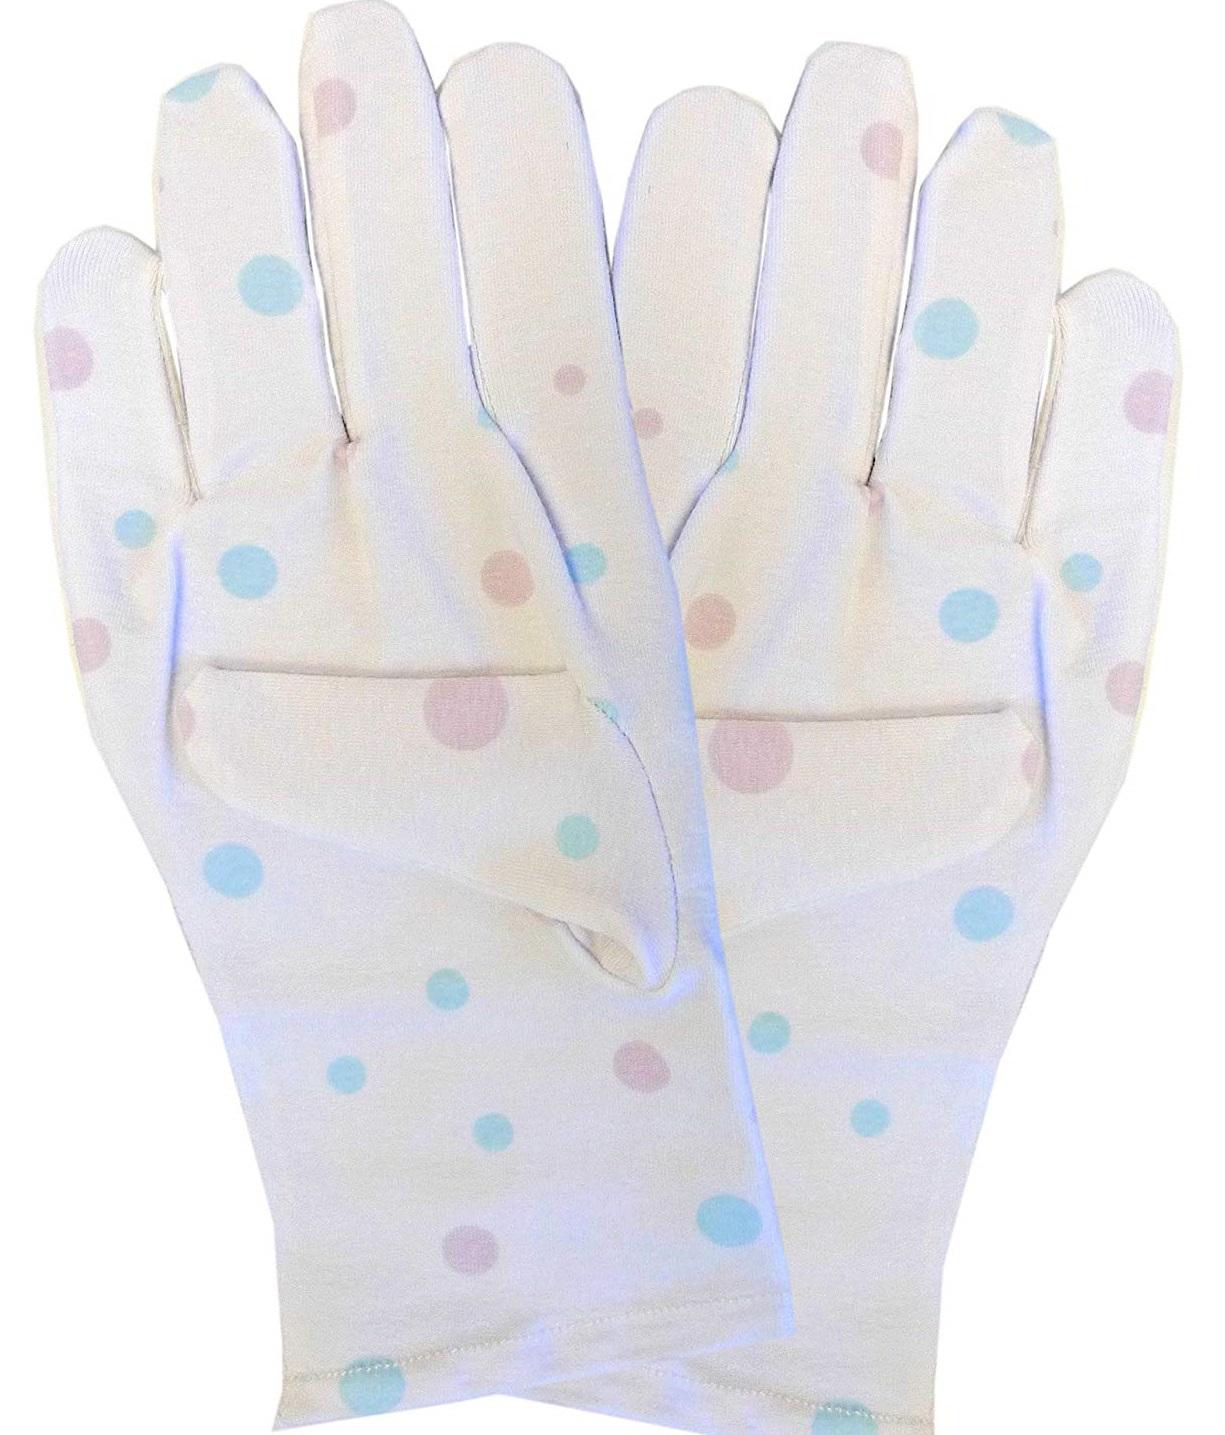 Aquasentials Moisturizing Gloves